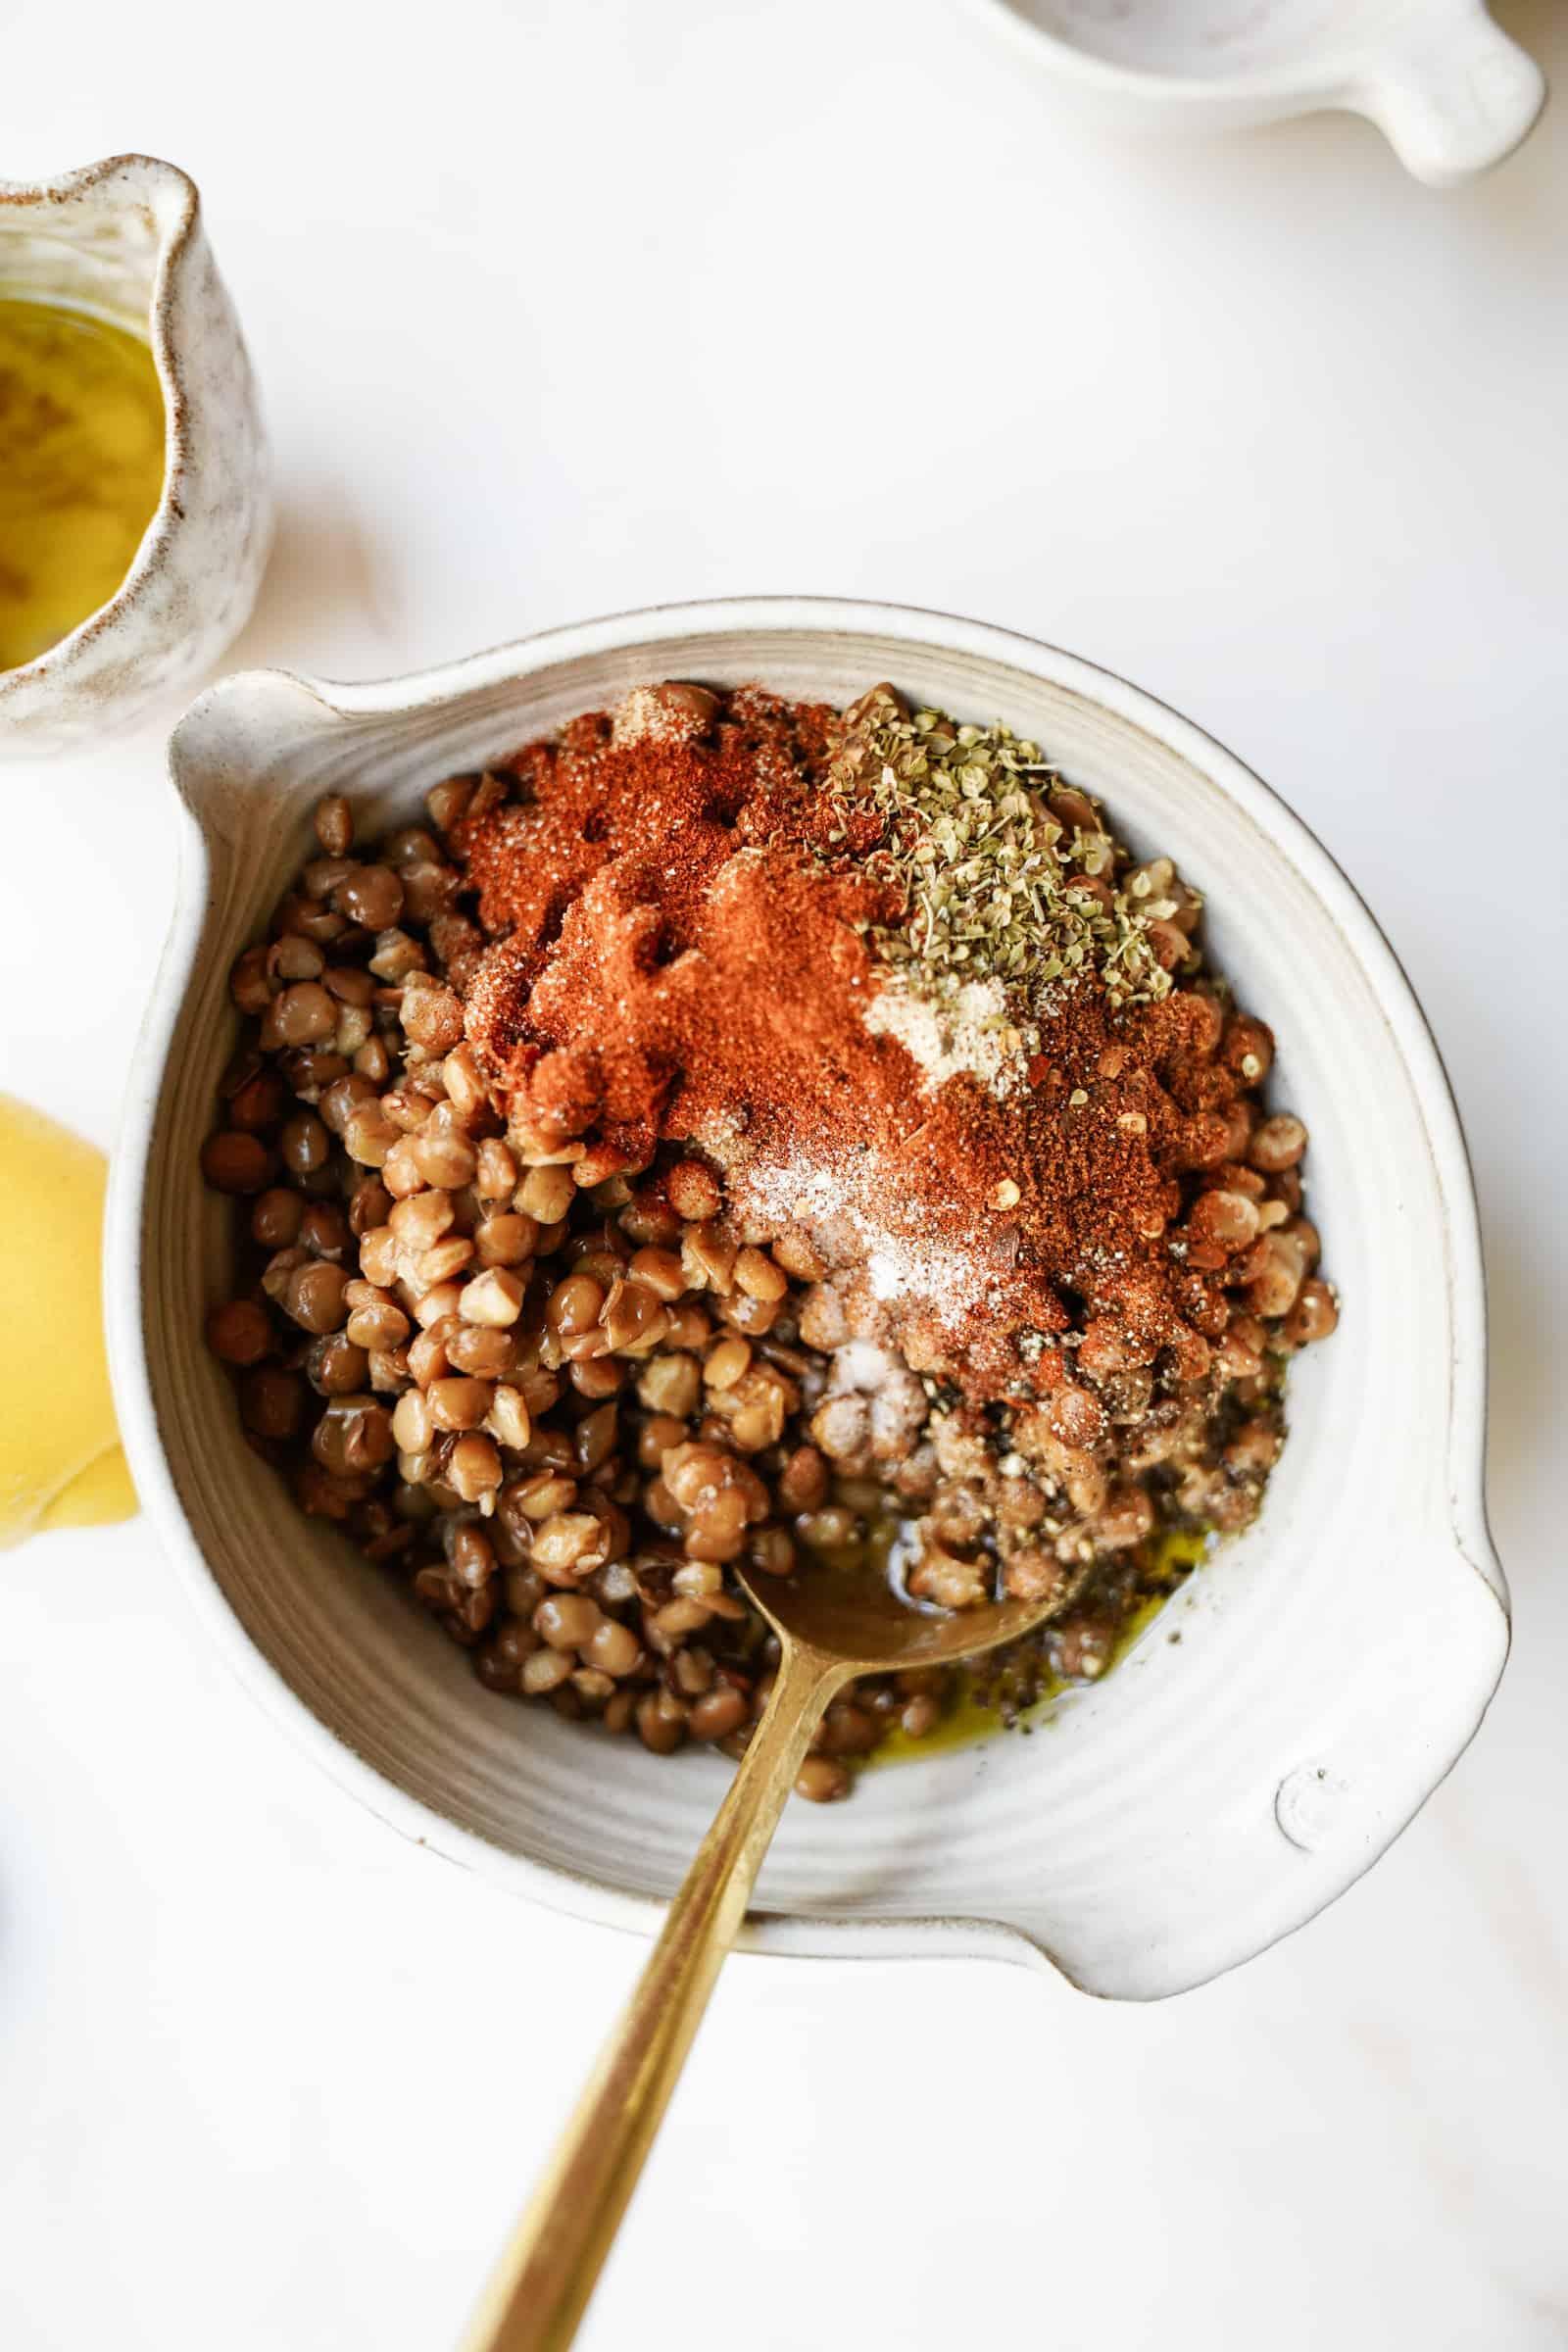 Lentils and seasoning for vegan taco salad